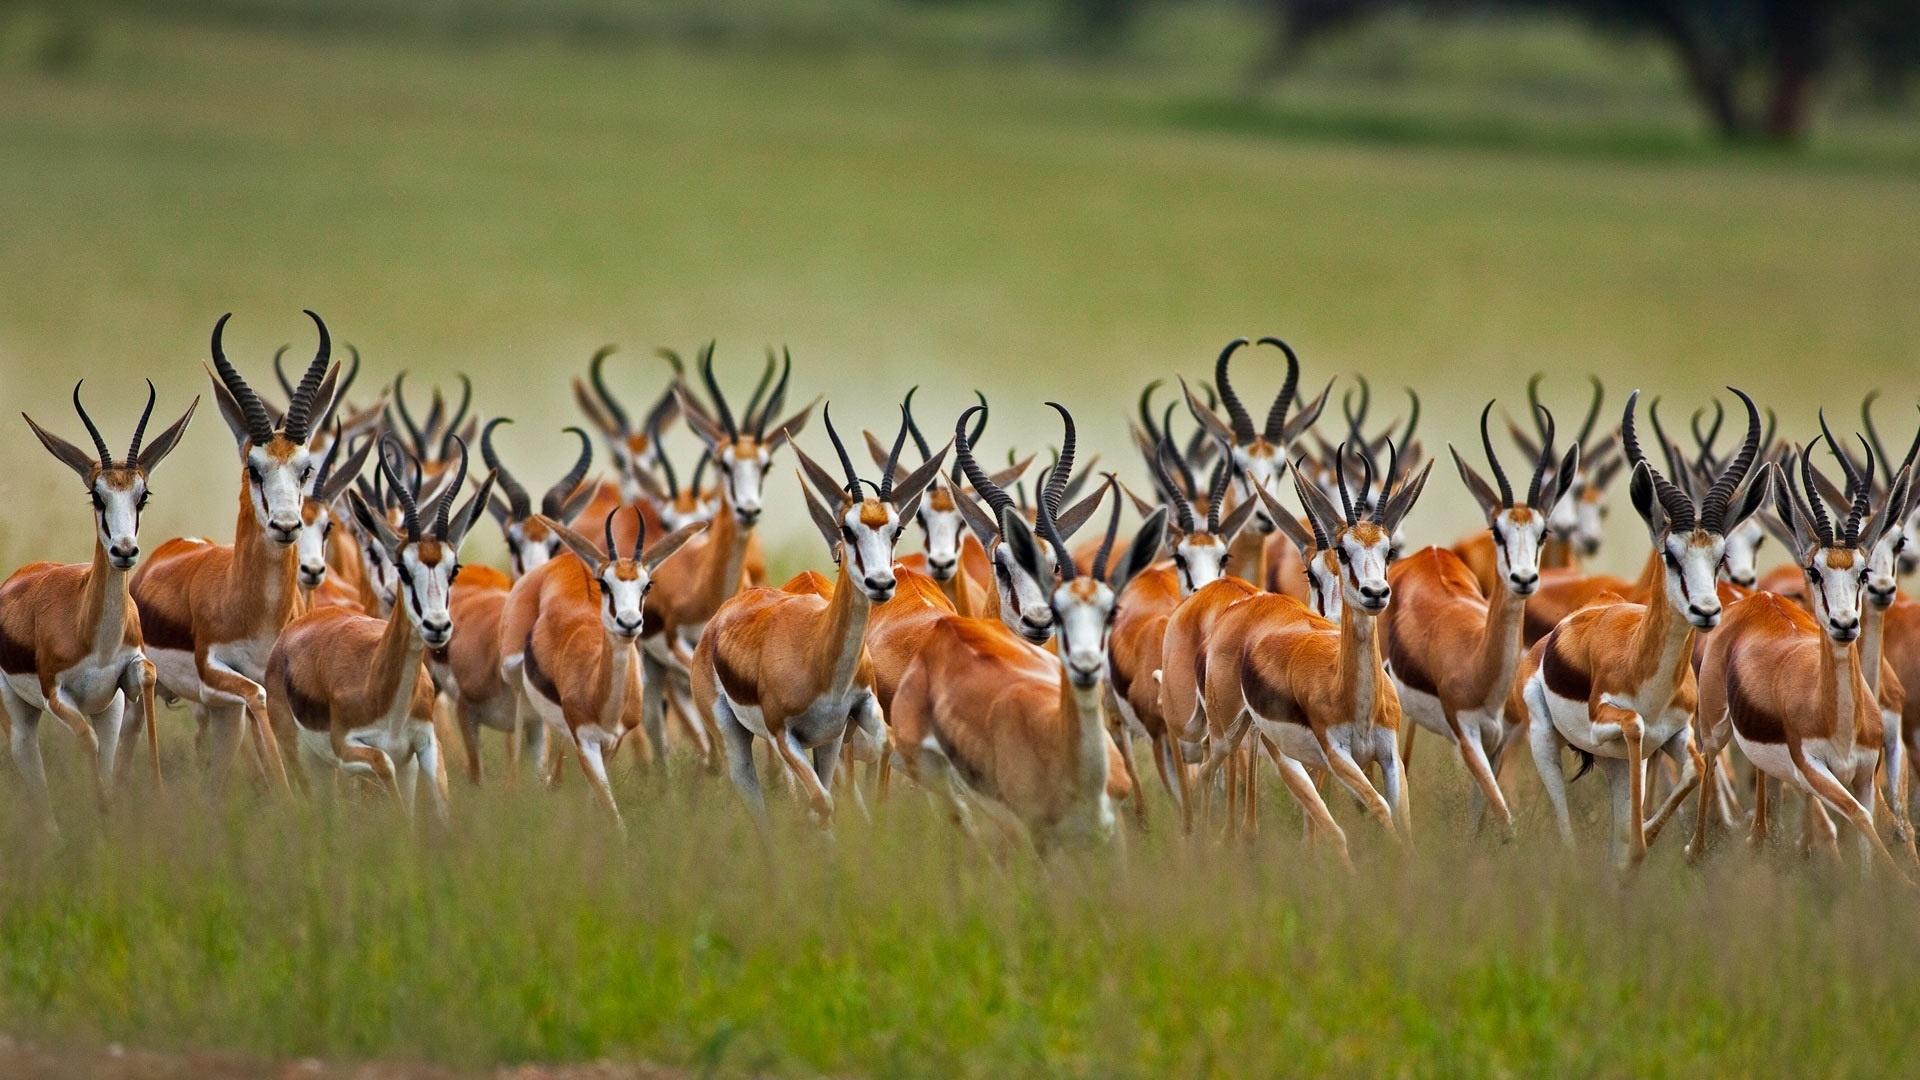 Antelope computer wallpaper